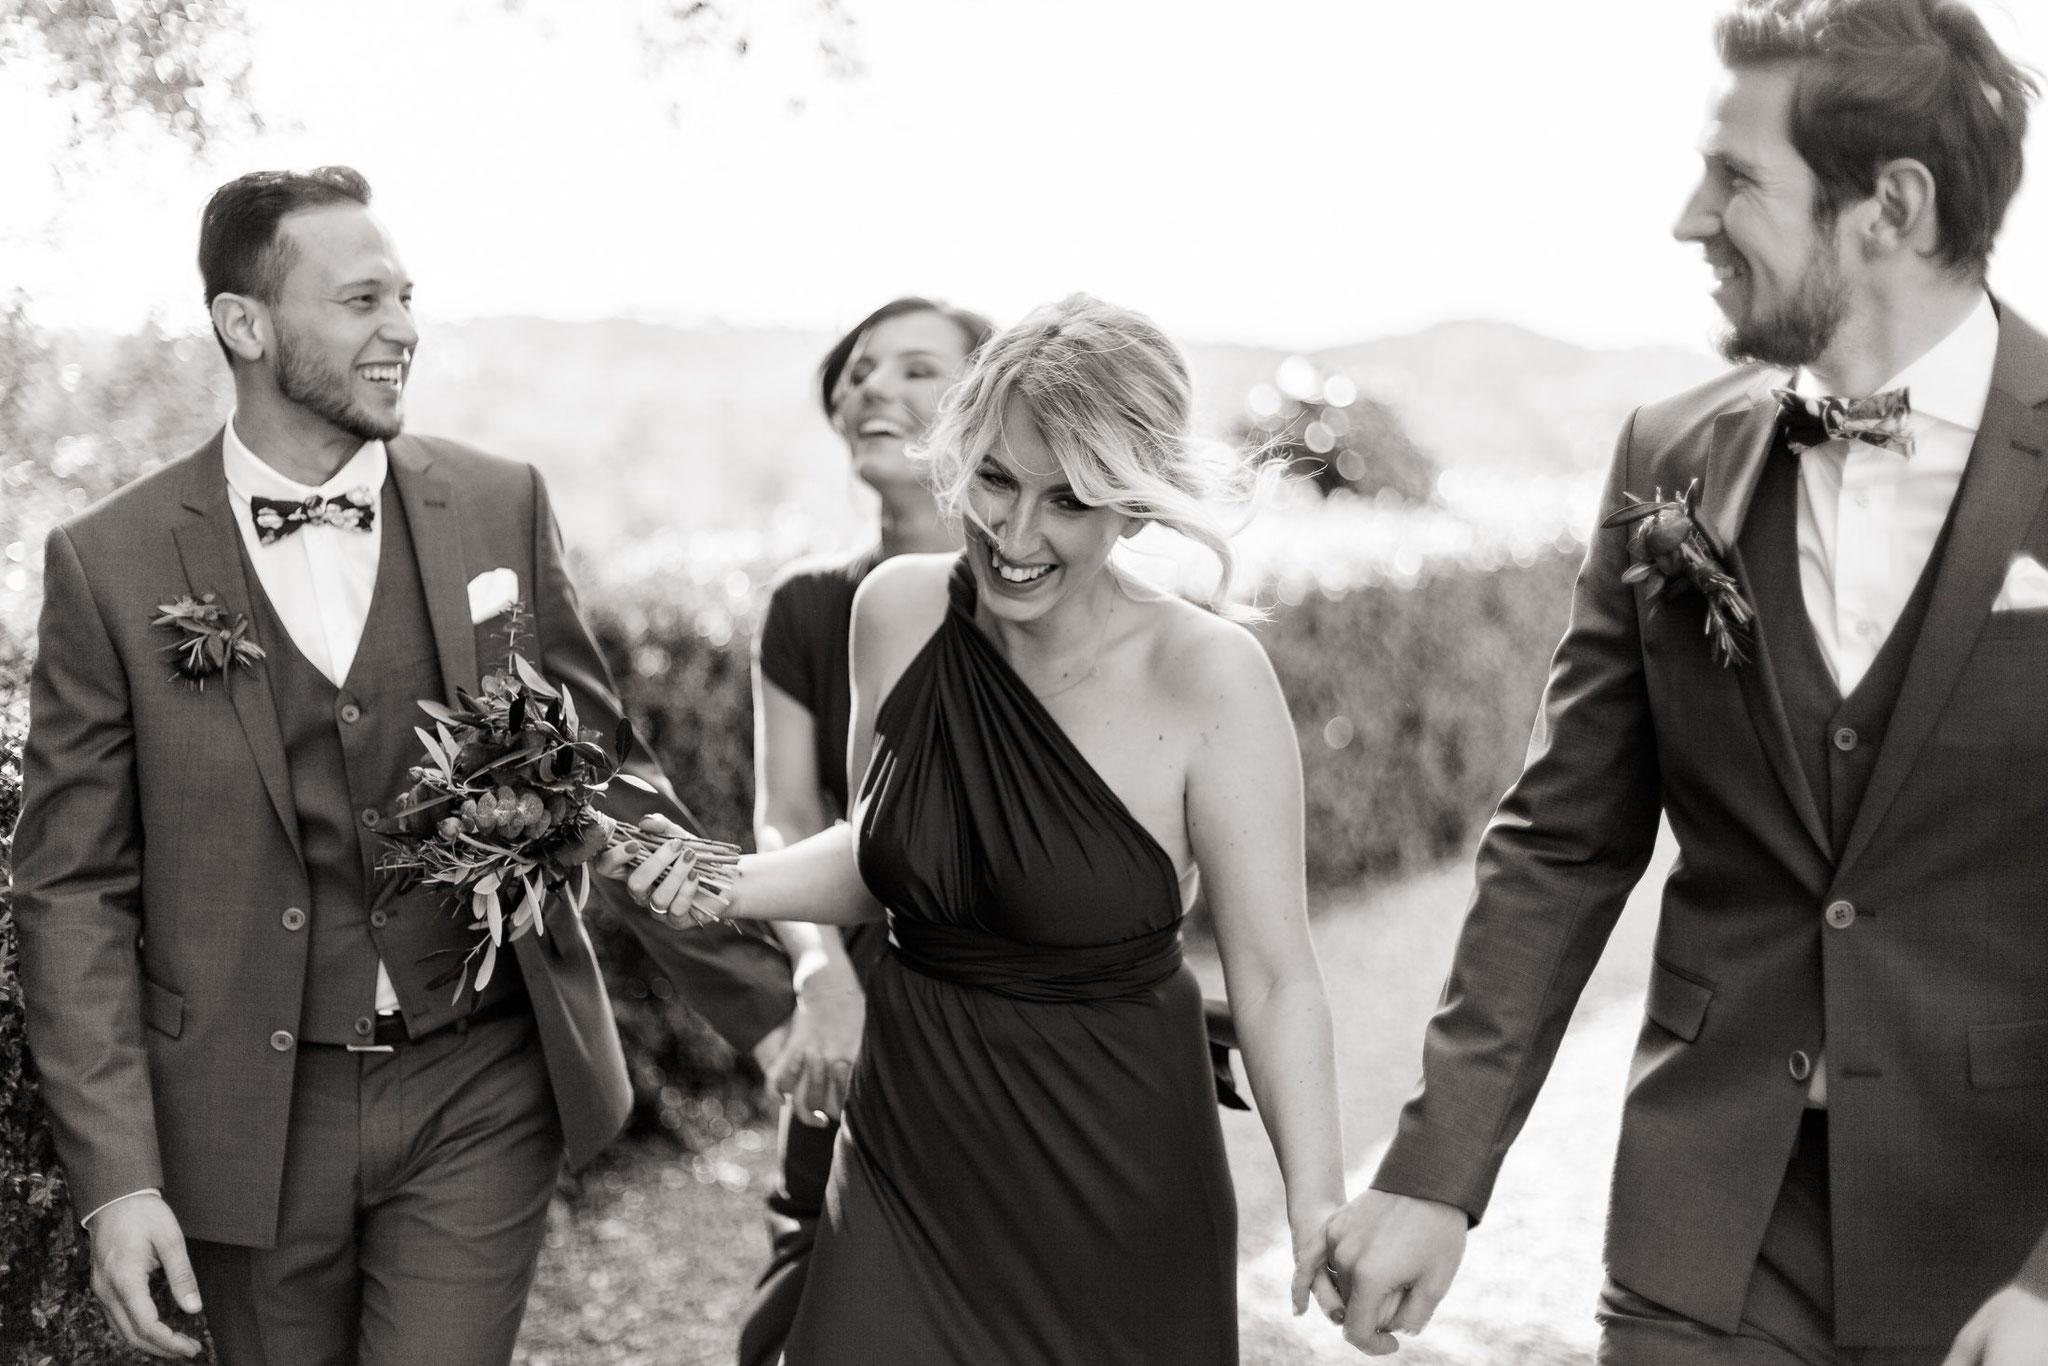 hochzeitsfotograf Italien Jane weber destination wedding bridal party bridal gang